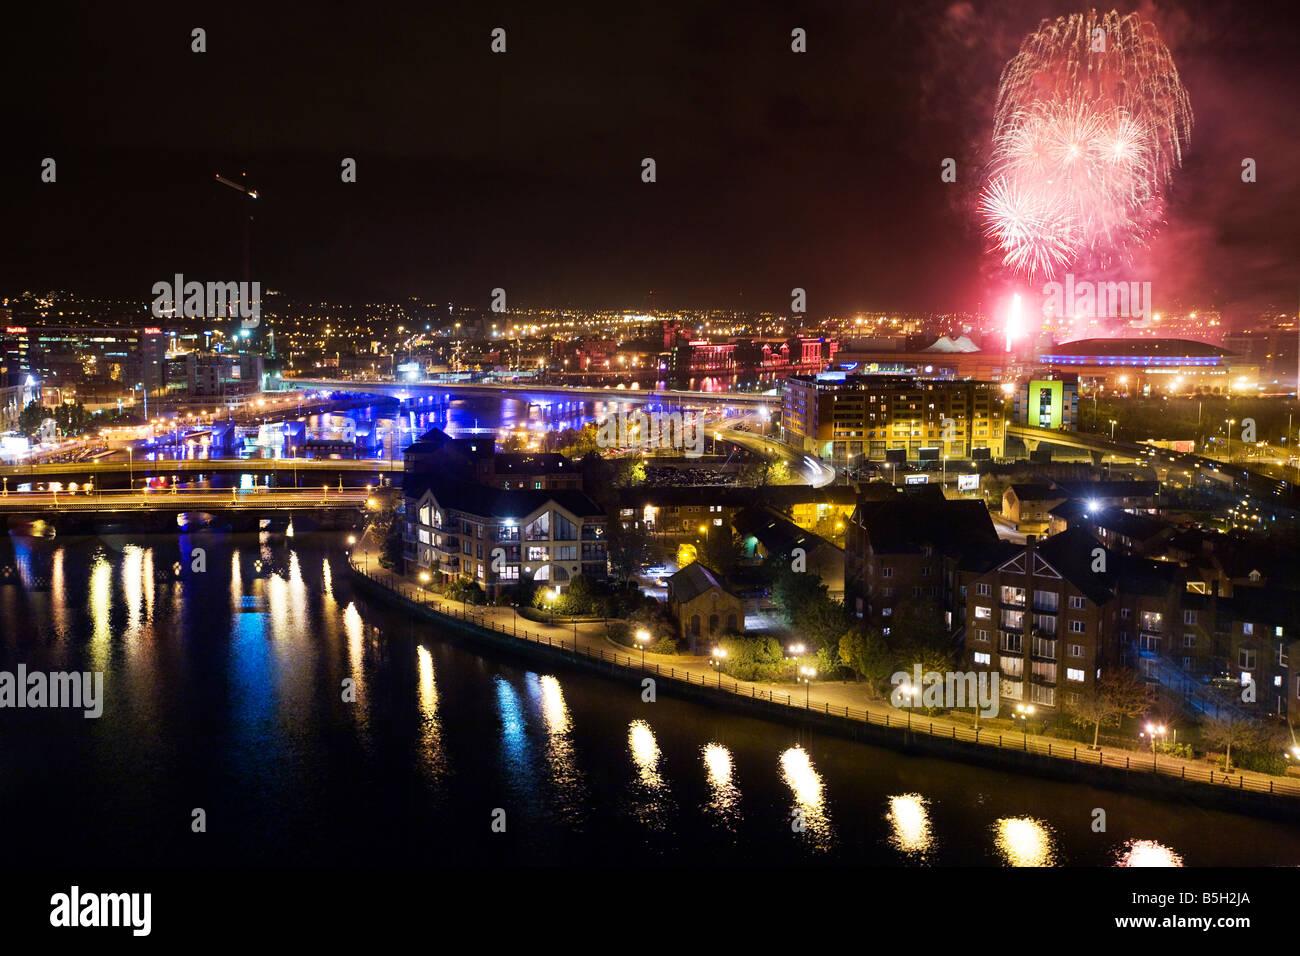 River Lagan Belfast Northern Ireland - Stock Image